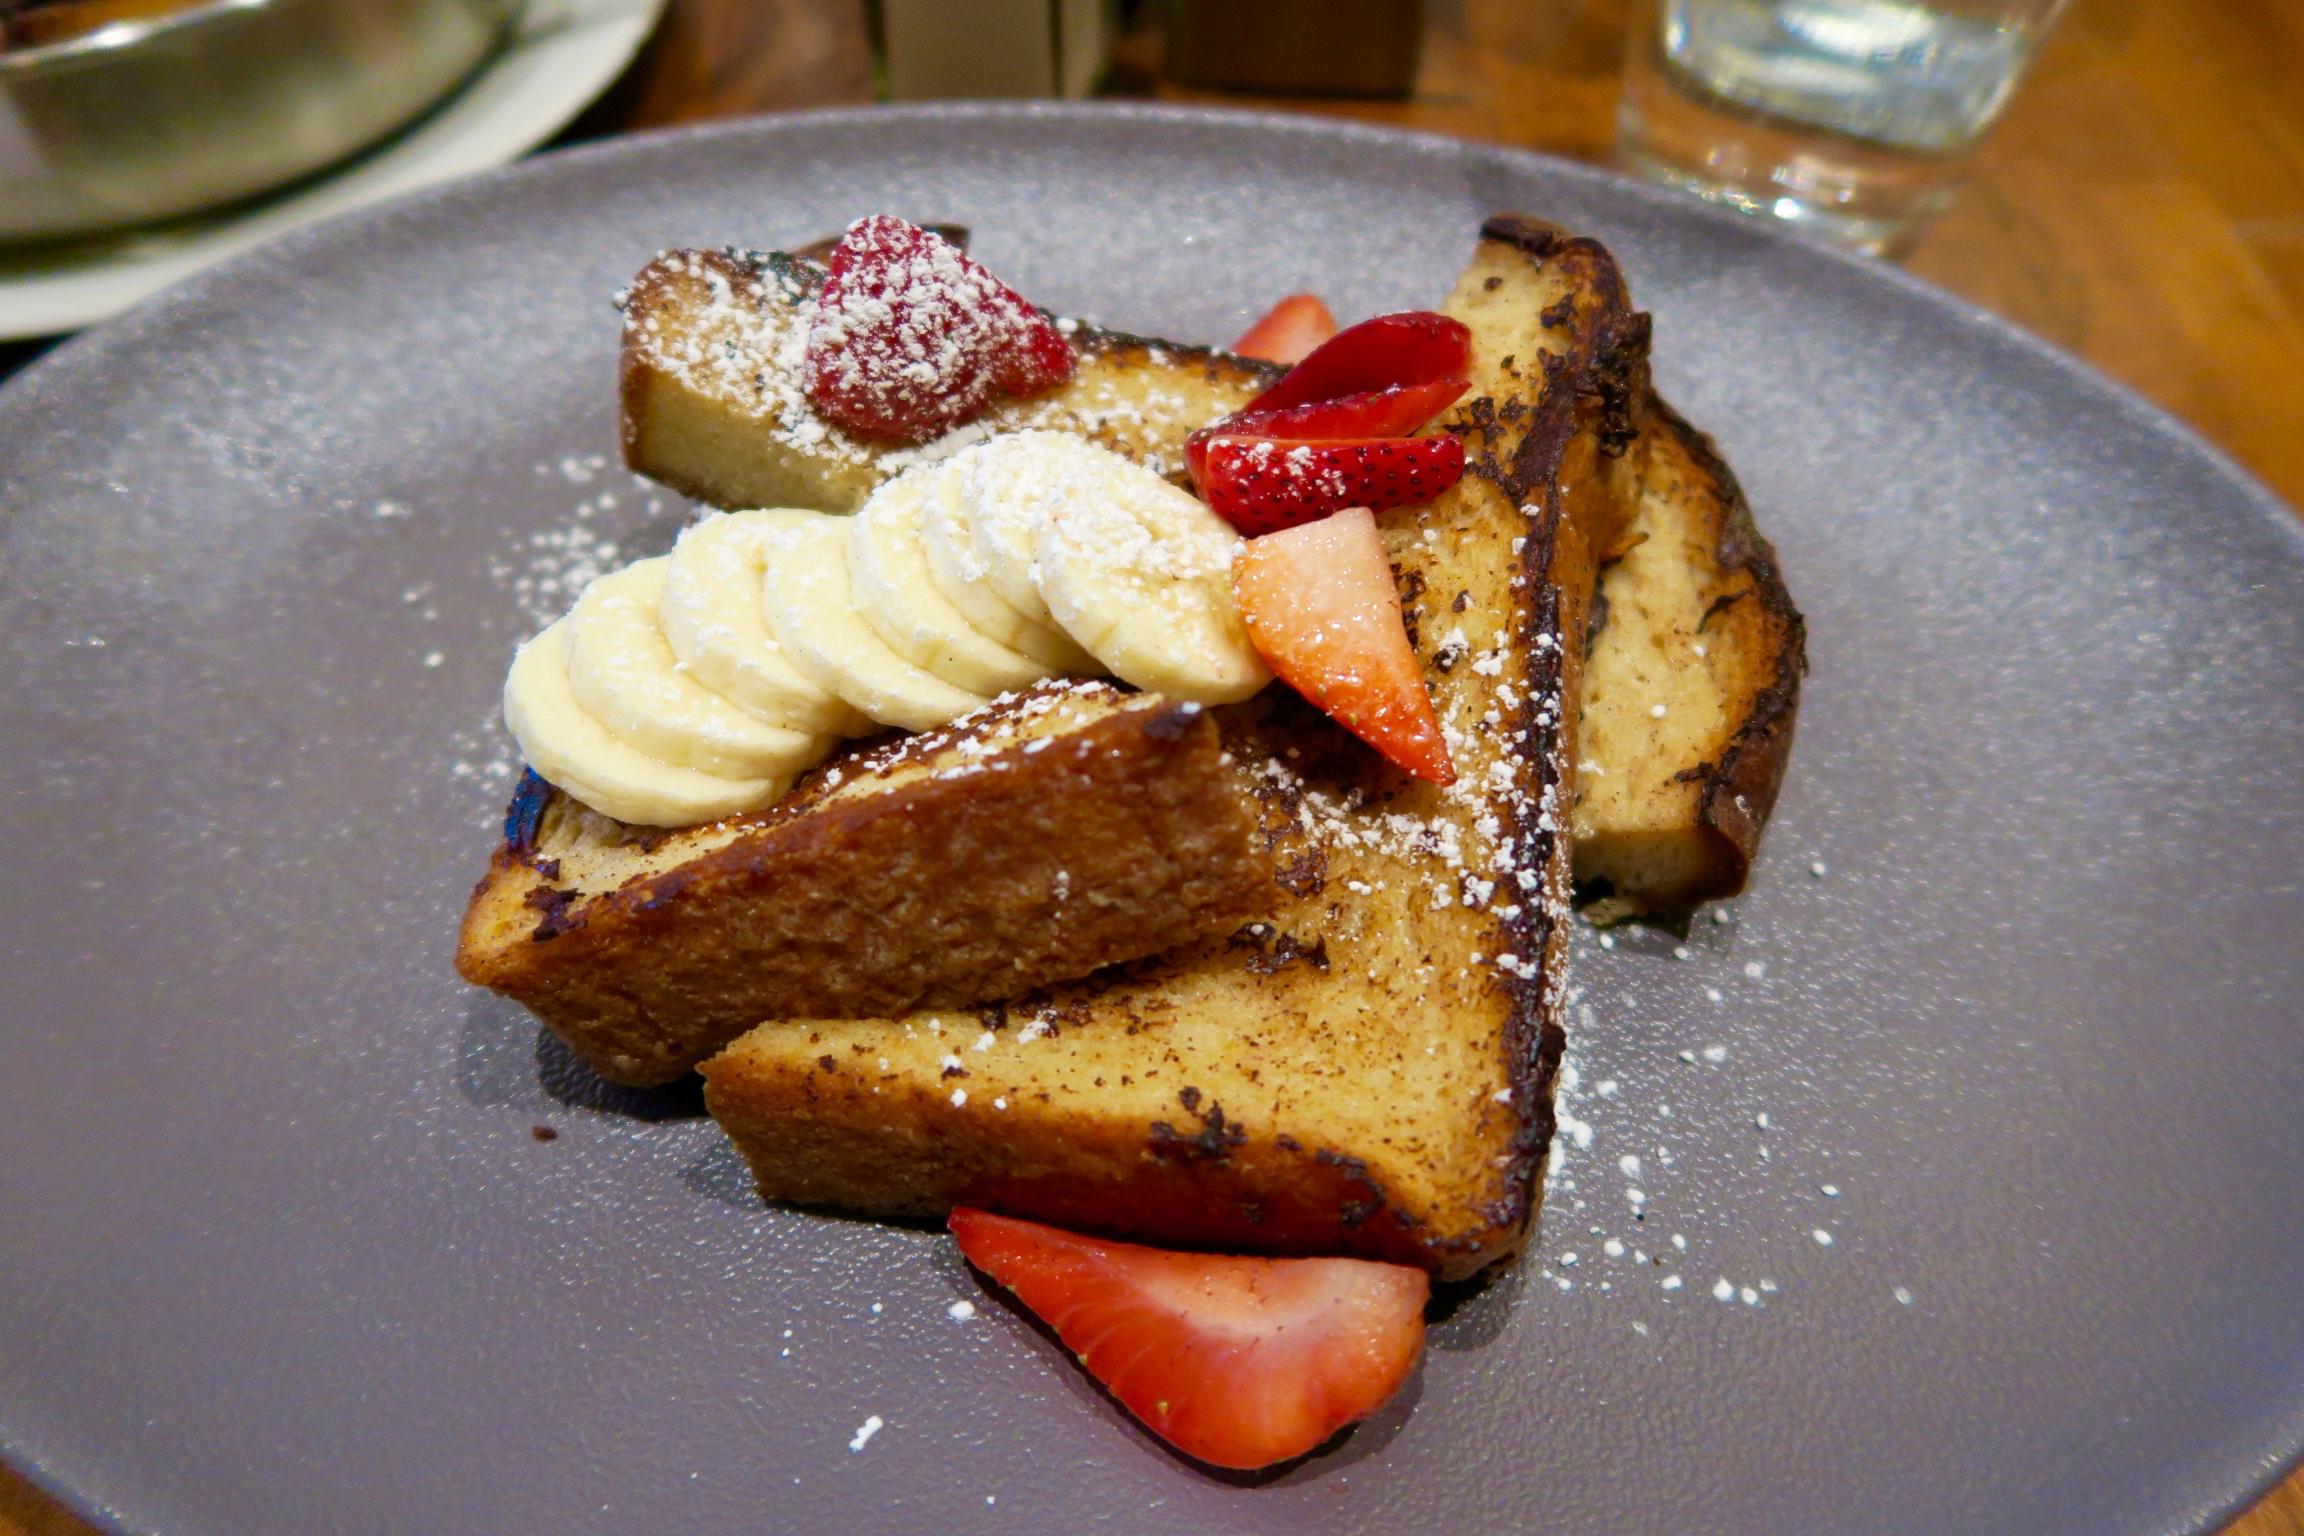 Vanilla Bean French Toast  brioche bread, crème brulée batter, fresh strawberries and bananas